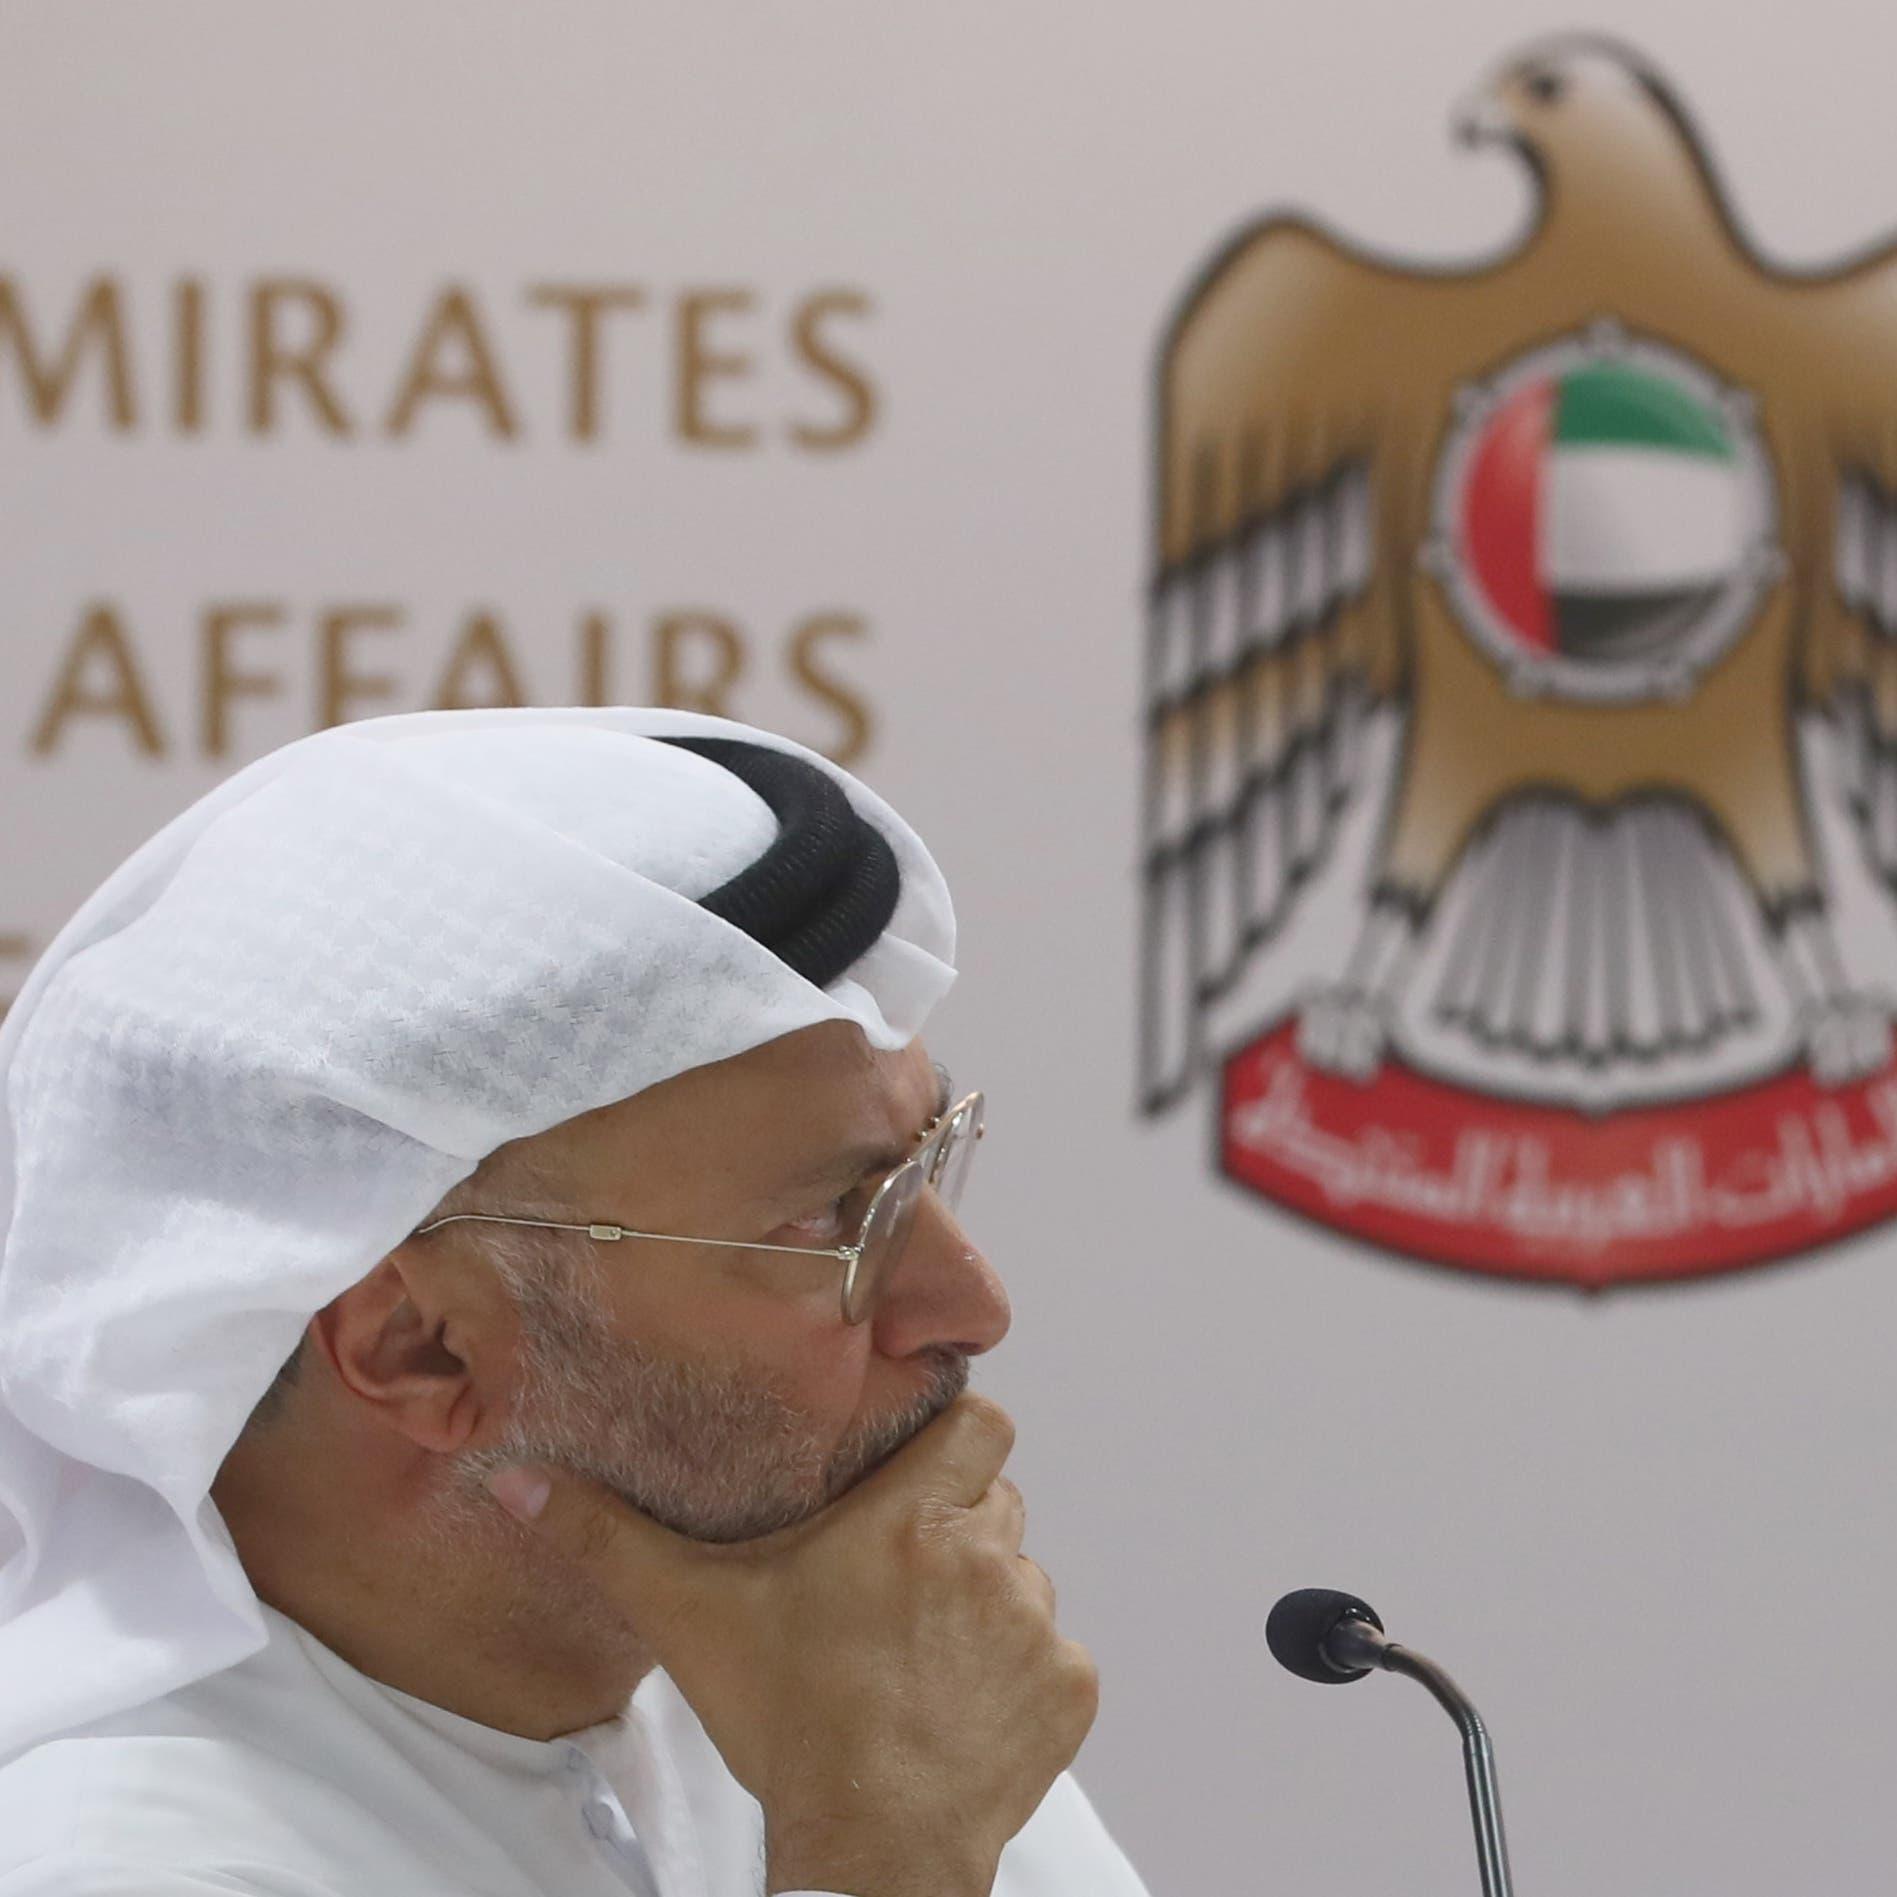 قرقاش: اتفاق الإمارات وإسرائيل قرار سيادي ليس ضد إيران